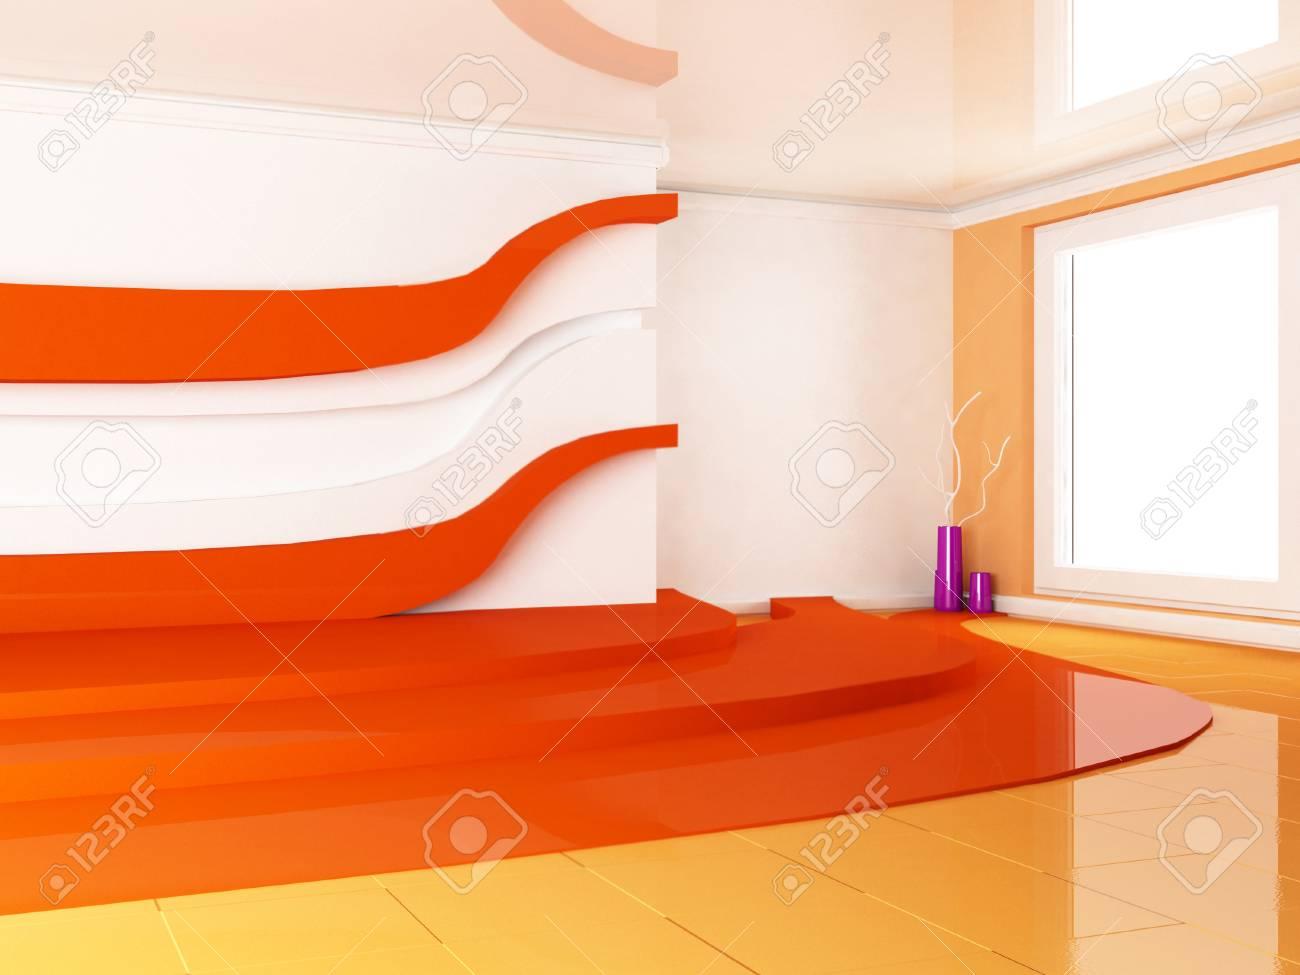 interior design scene with a window, the vases, Stock Photo - 22268960